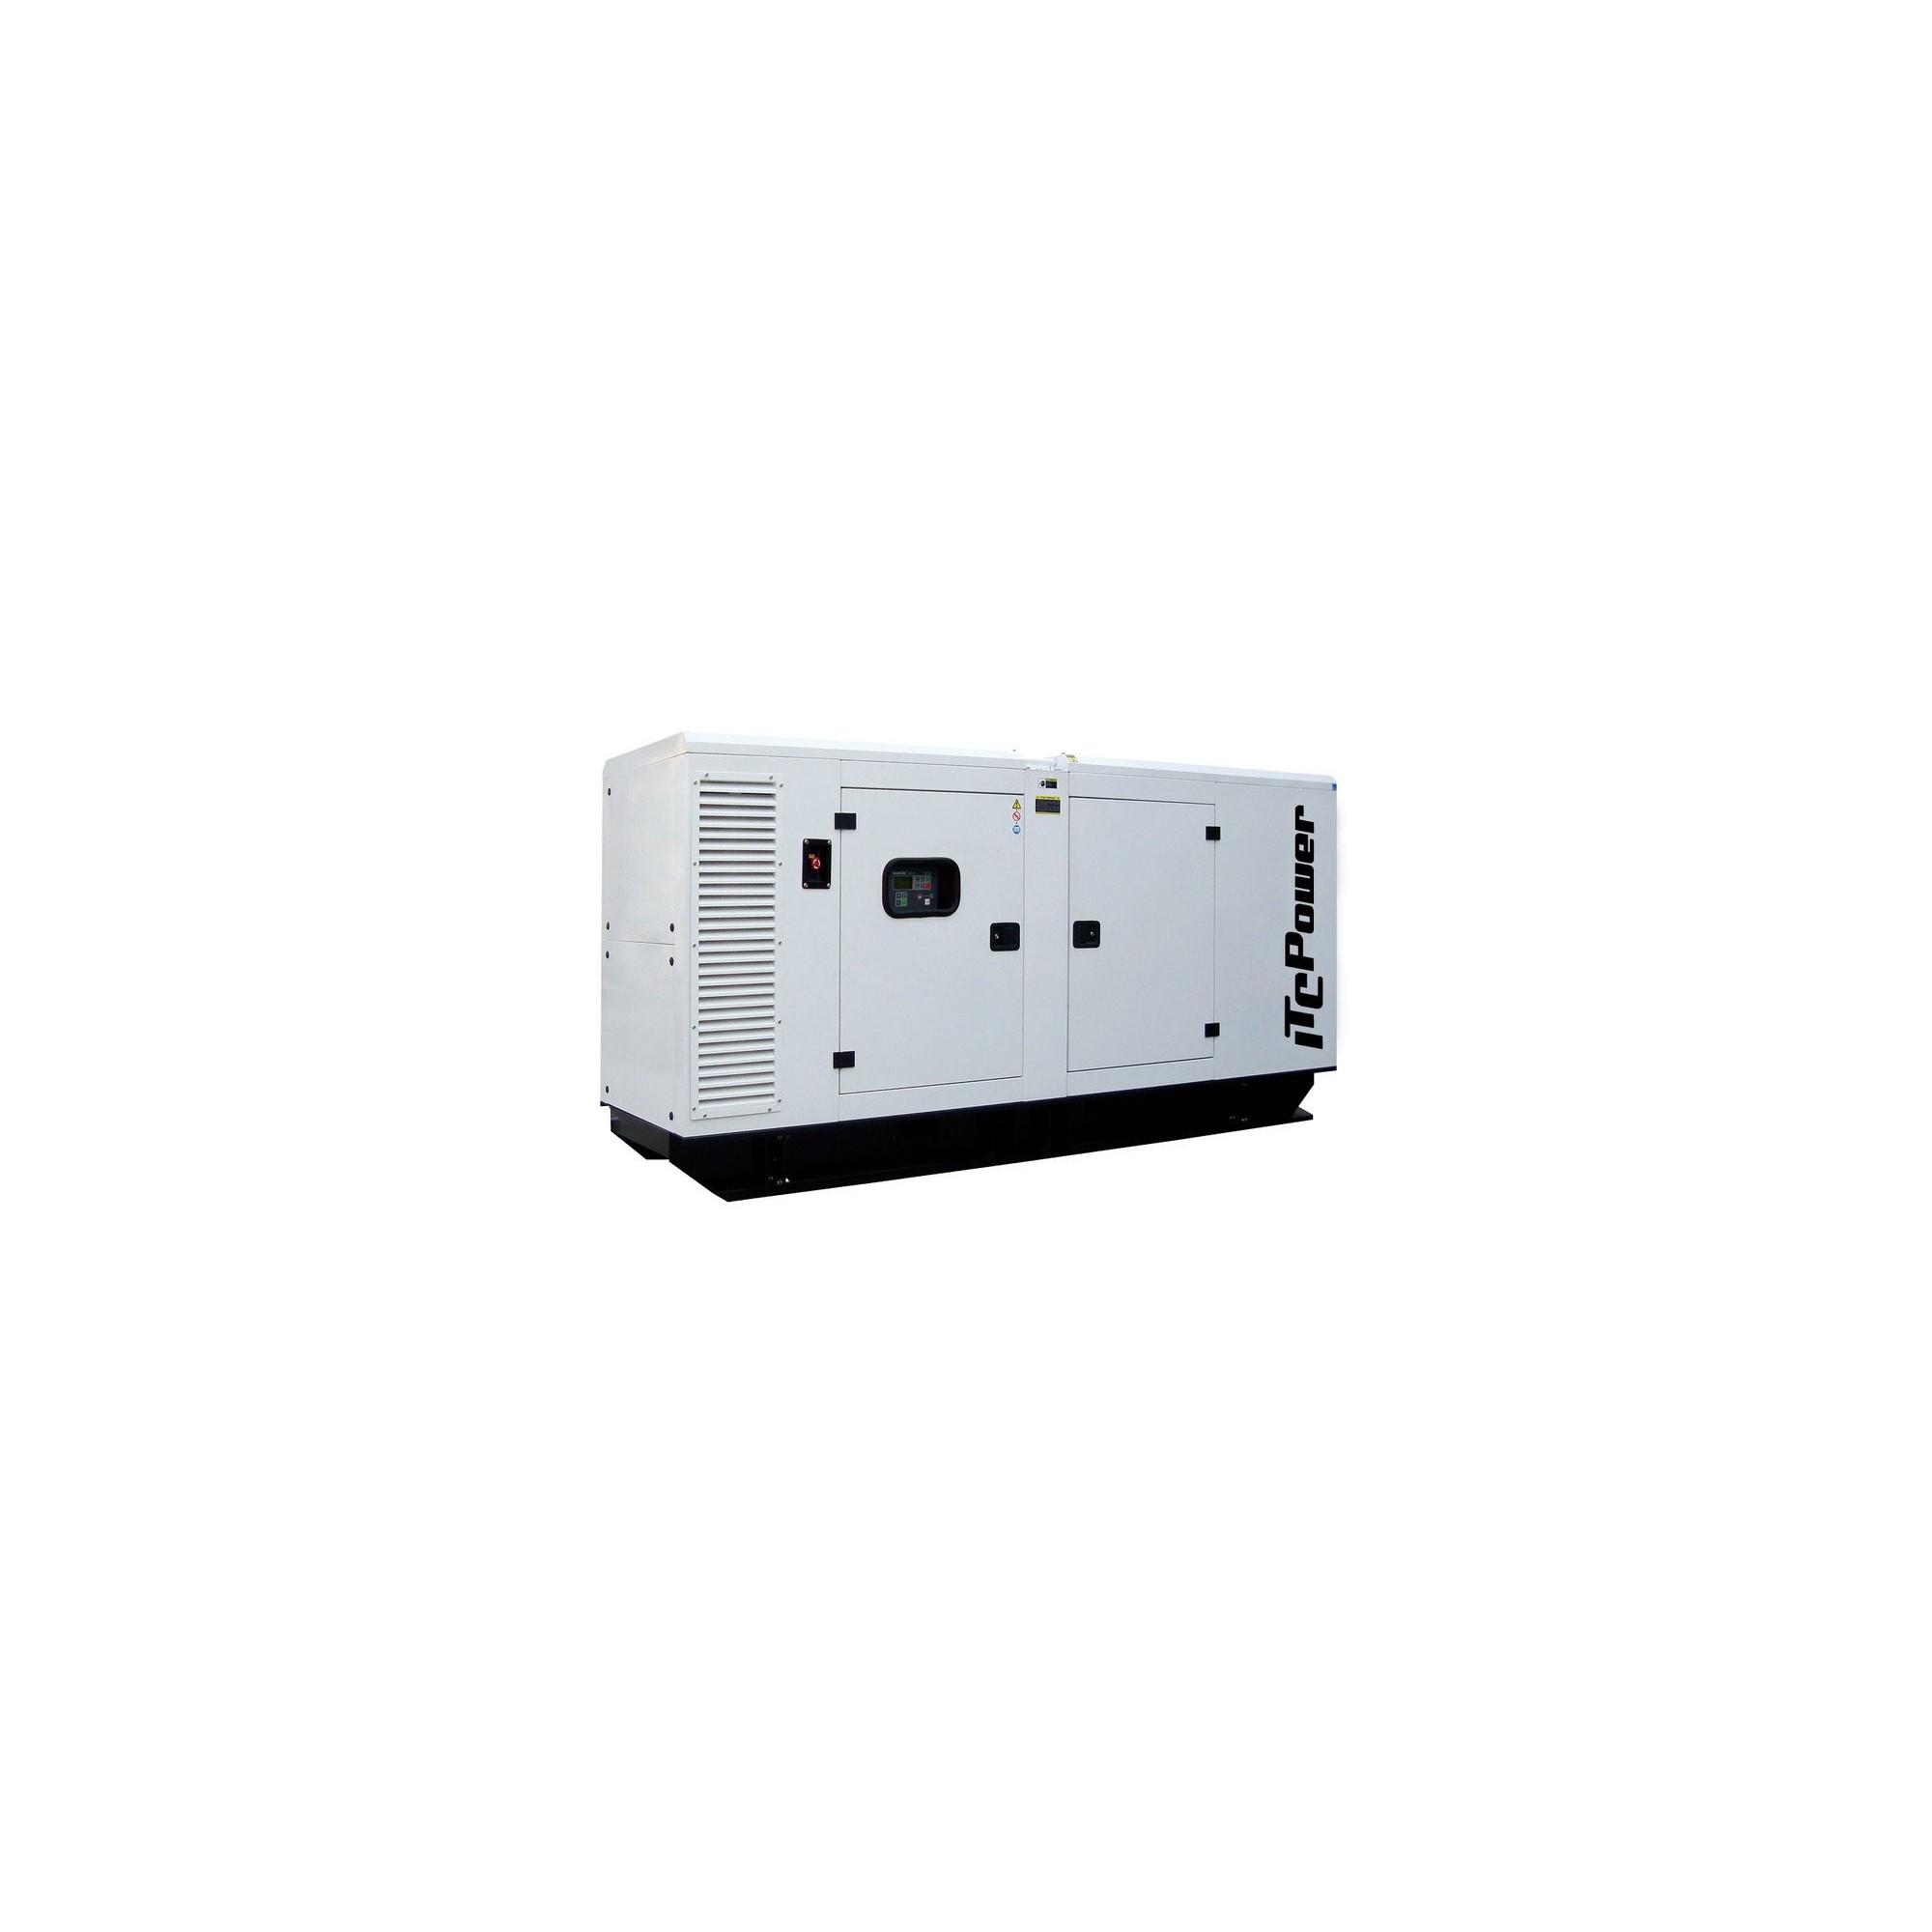 GRUPO ELECTROGENO INSONORIZADO TRIFÁSICO ITCPOWER DG90KSE 90KVAS